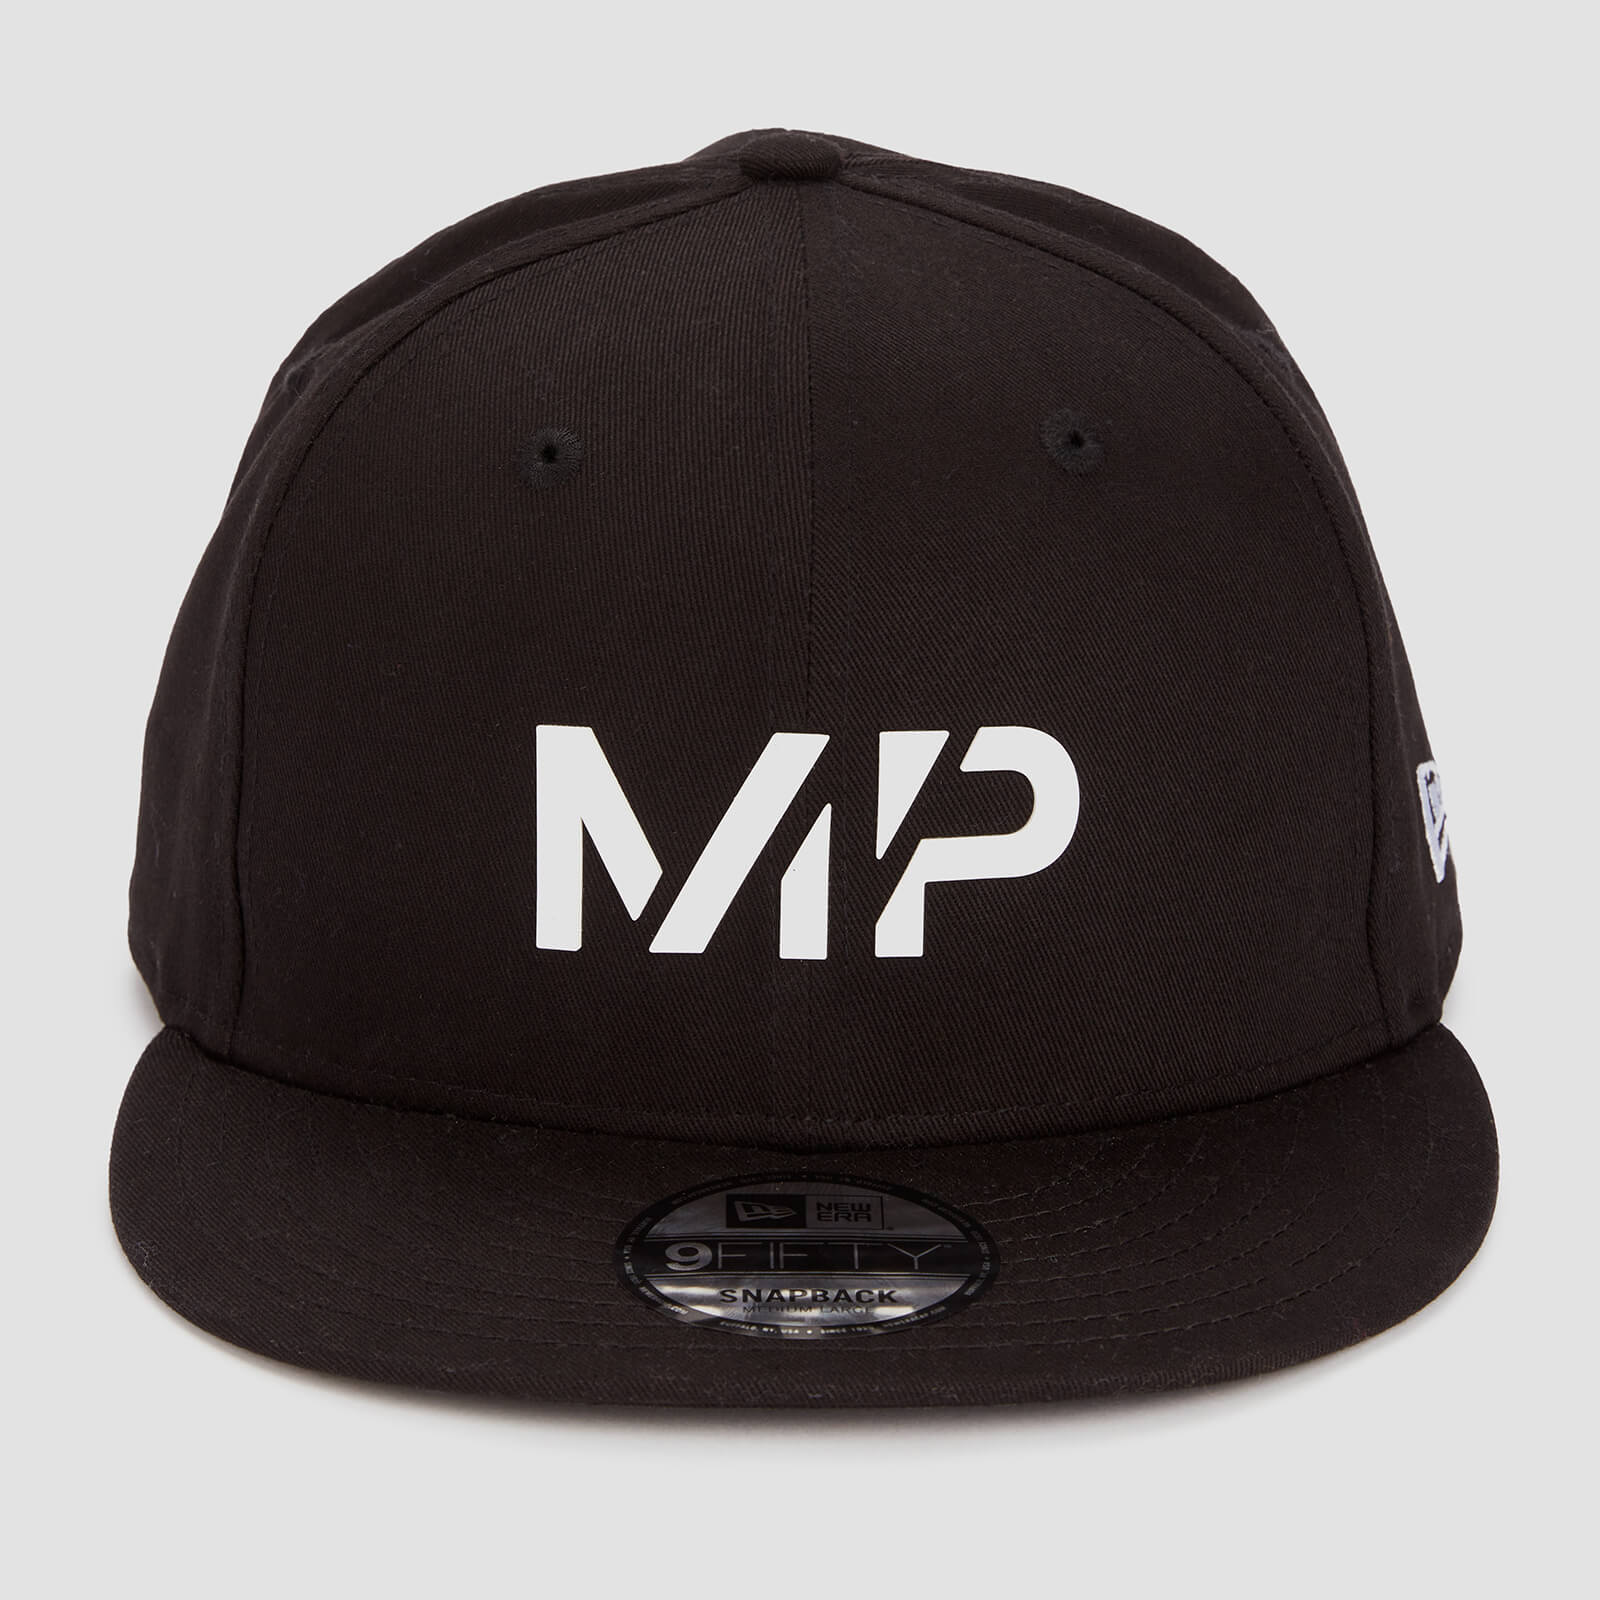 MP New Era 9FIFTY Snapback - Black/White - S-M